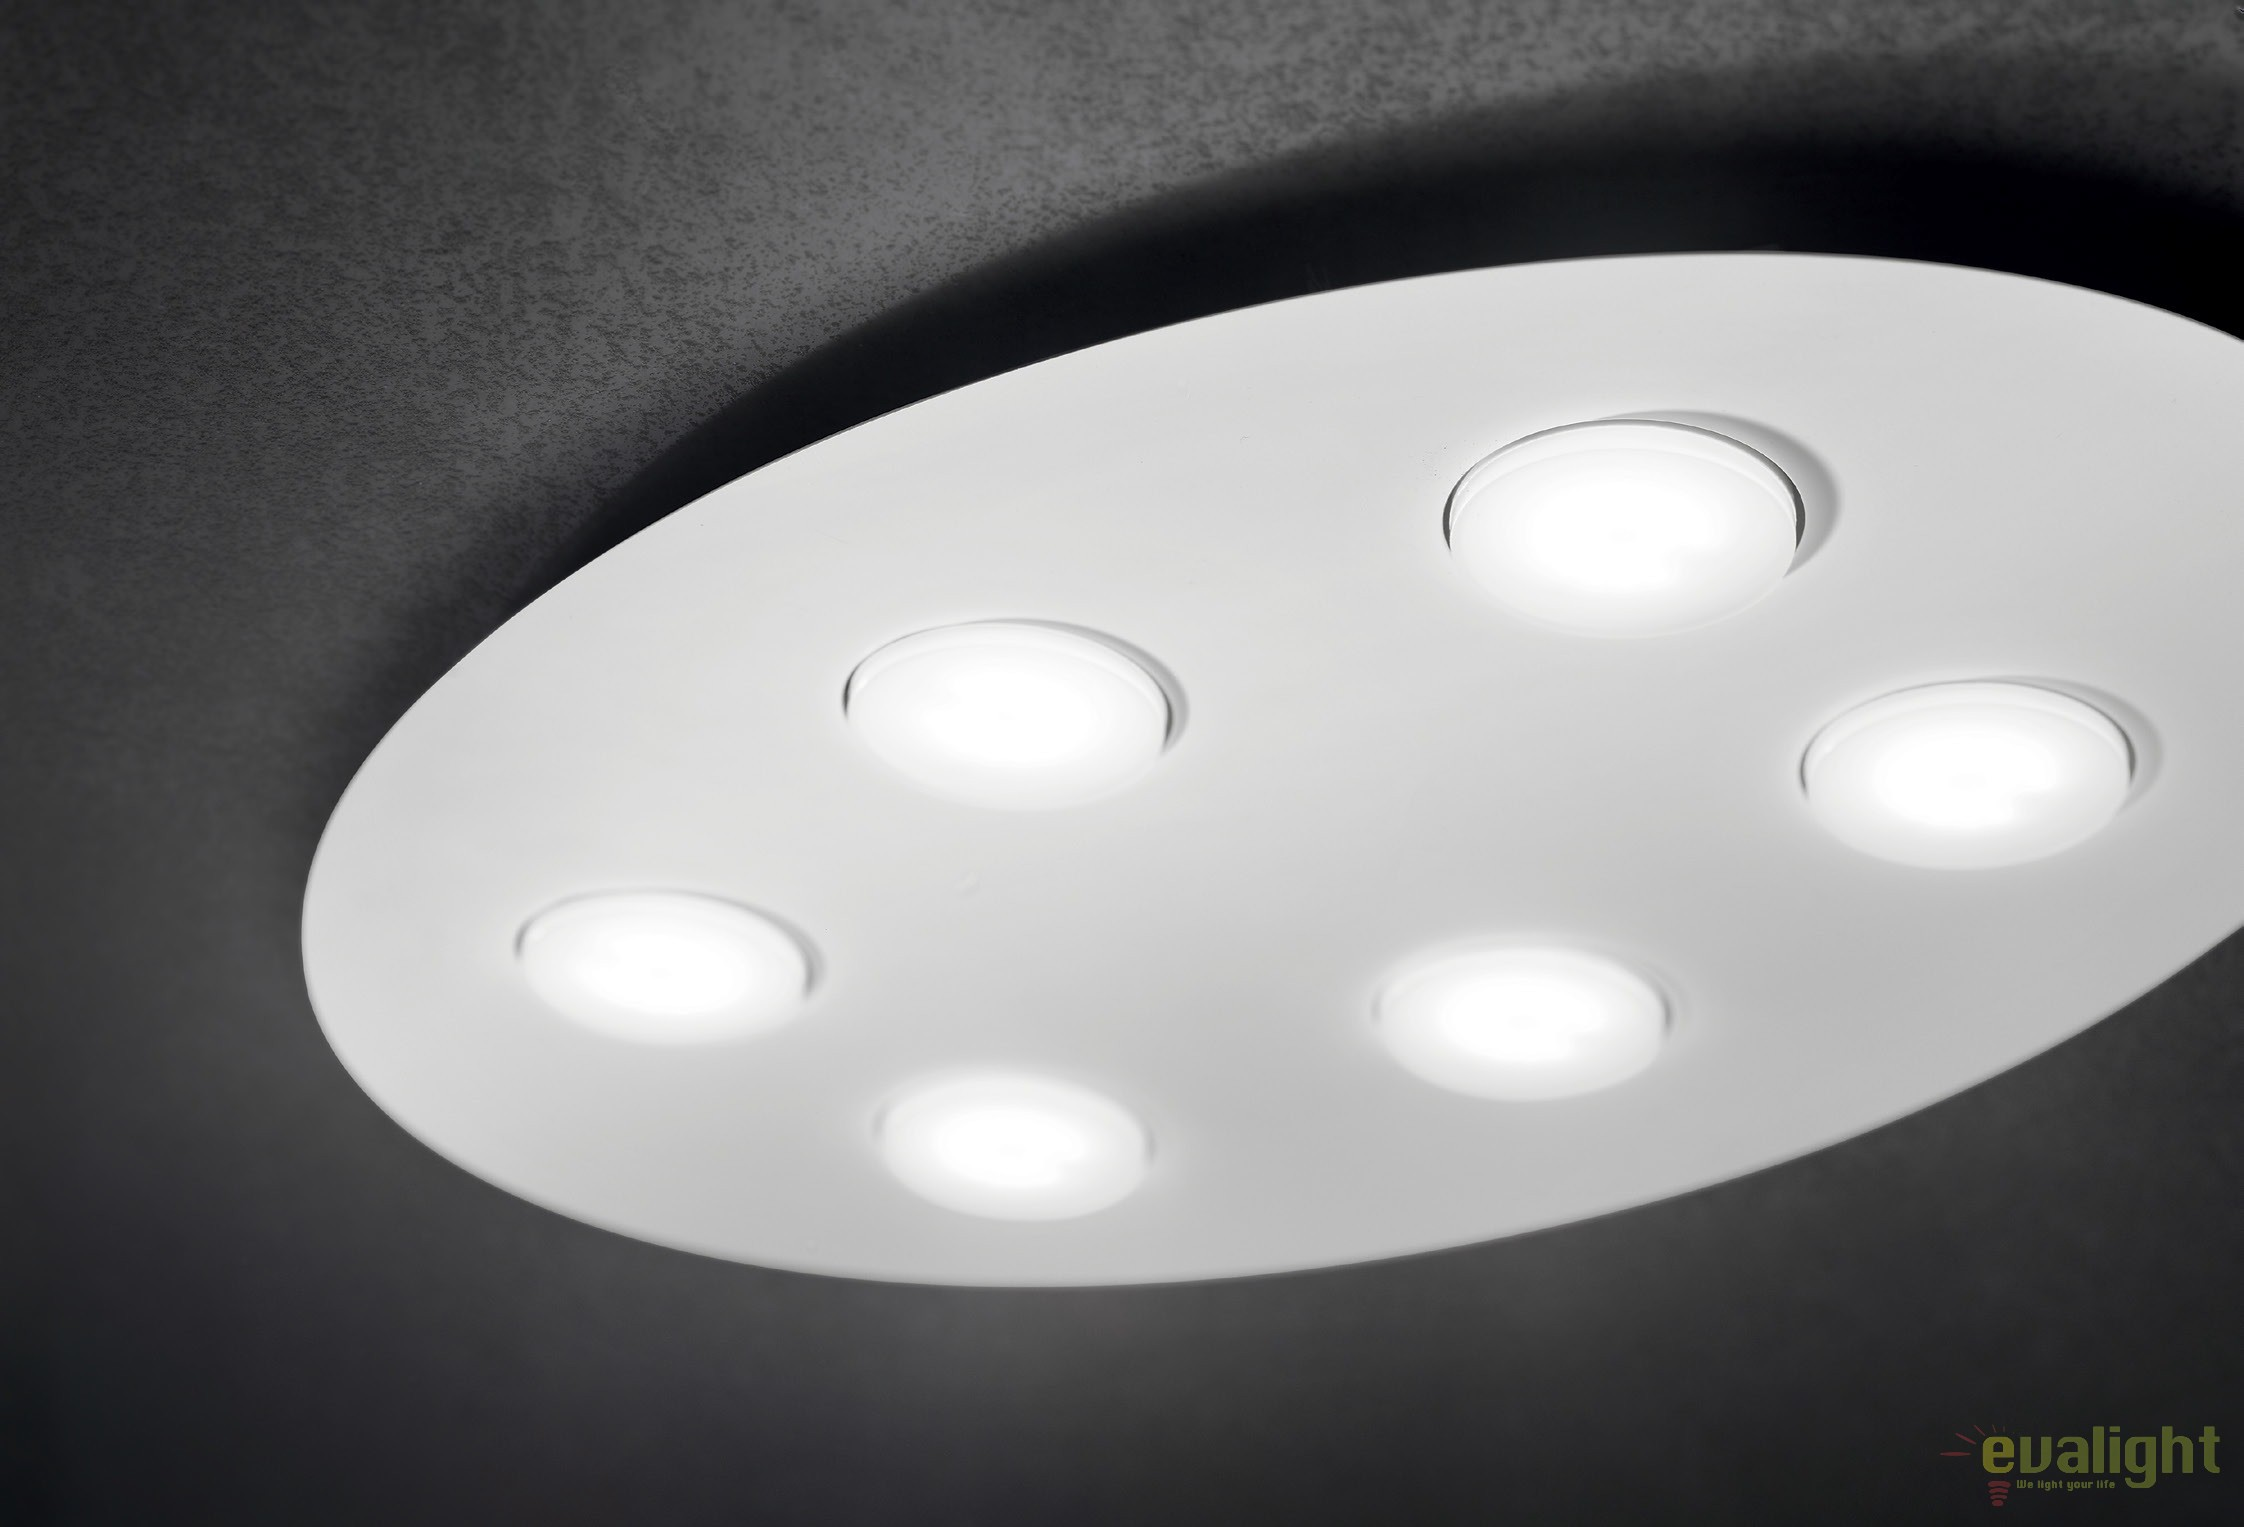 Plafoniera Led Moderna : Plafoniera led moderna logos pl nero corpuri de iluminat